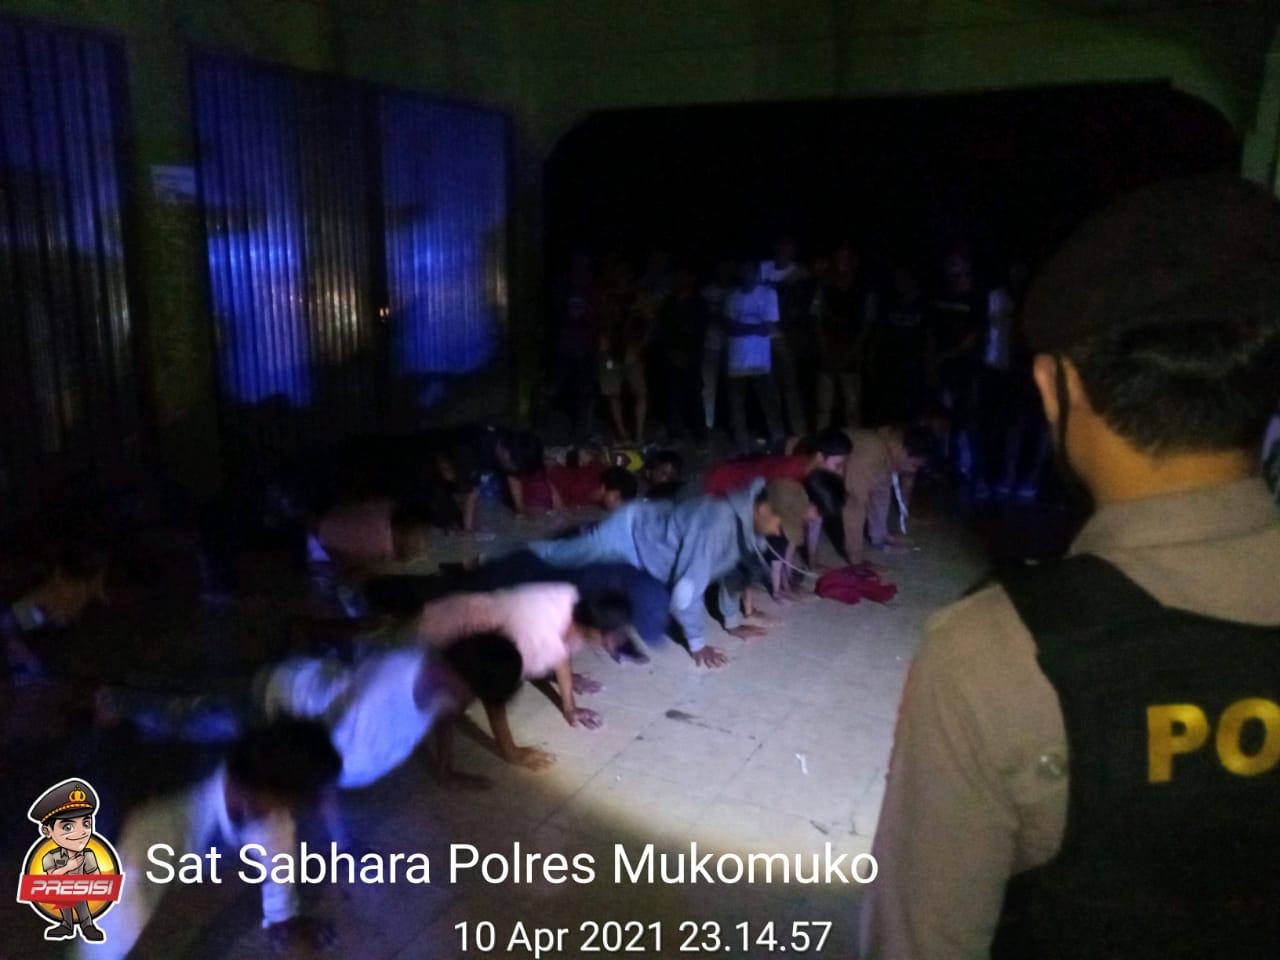 Langgar Prokes dan Minum Tuak, Polres Mukomuko Tegur Kumpulan Pemuda